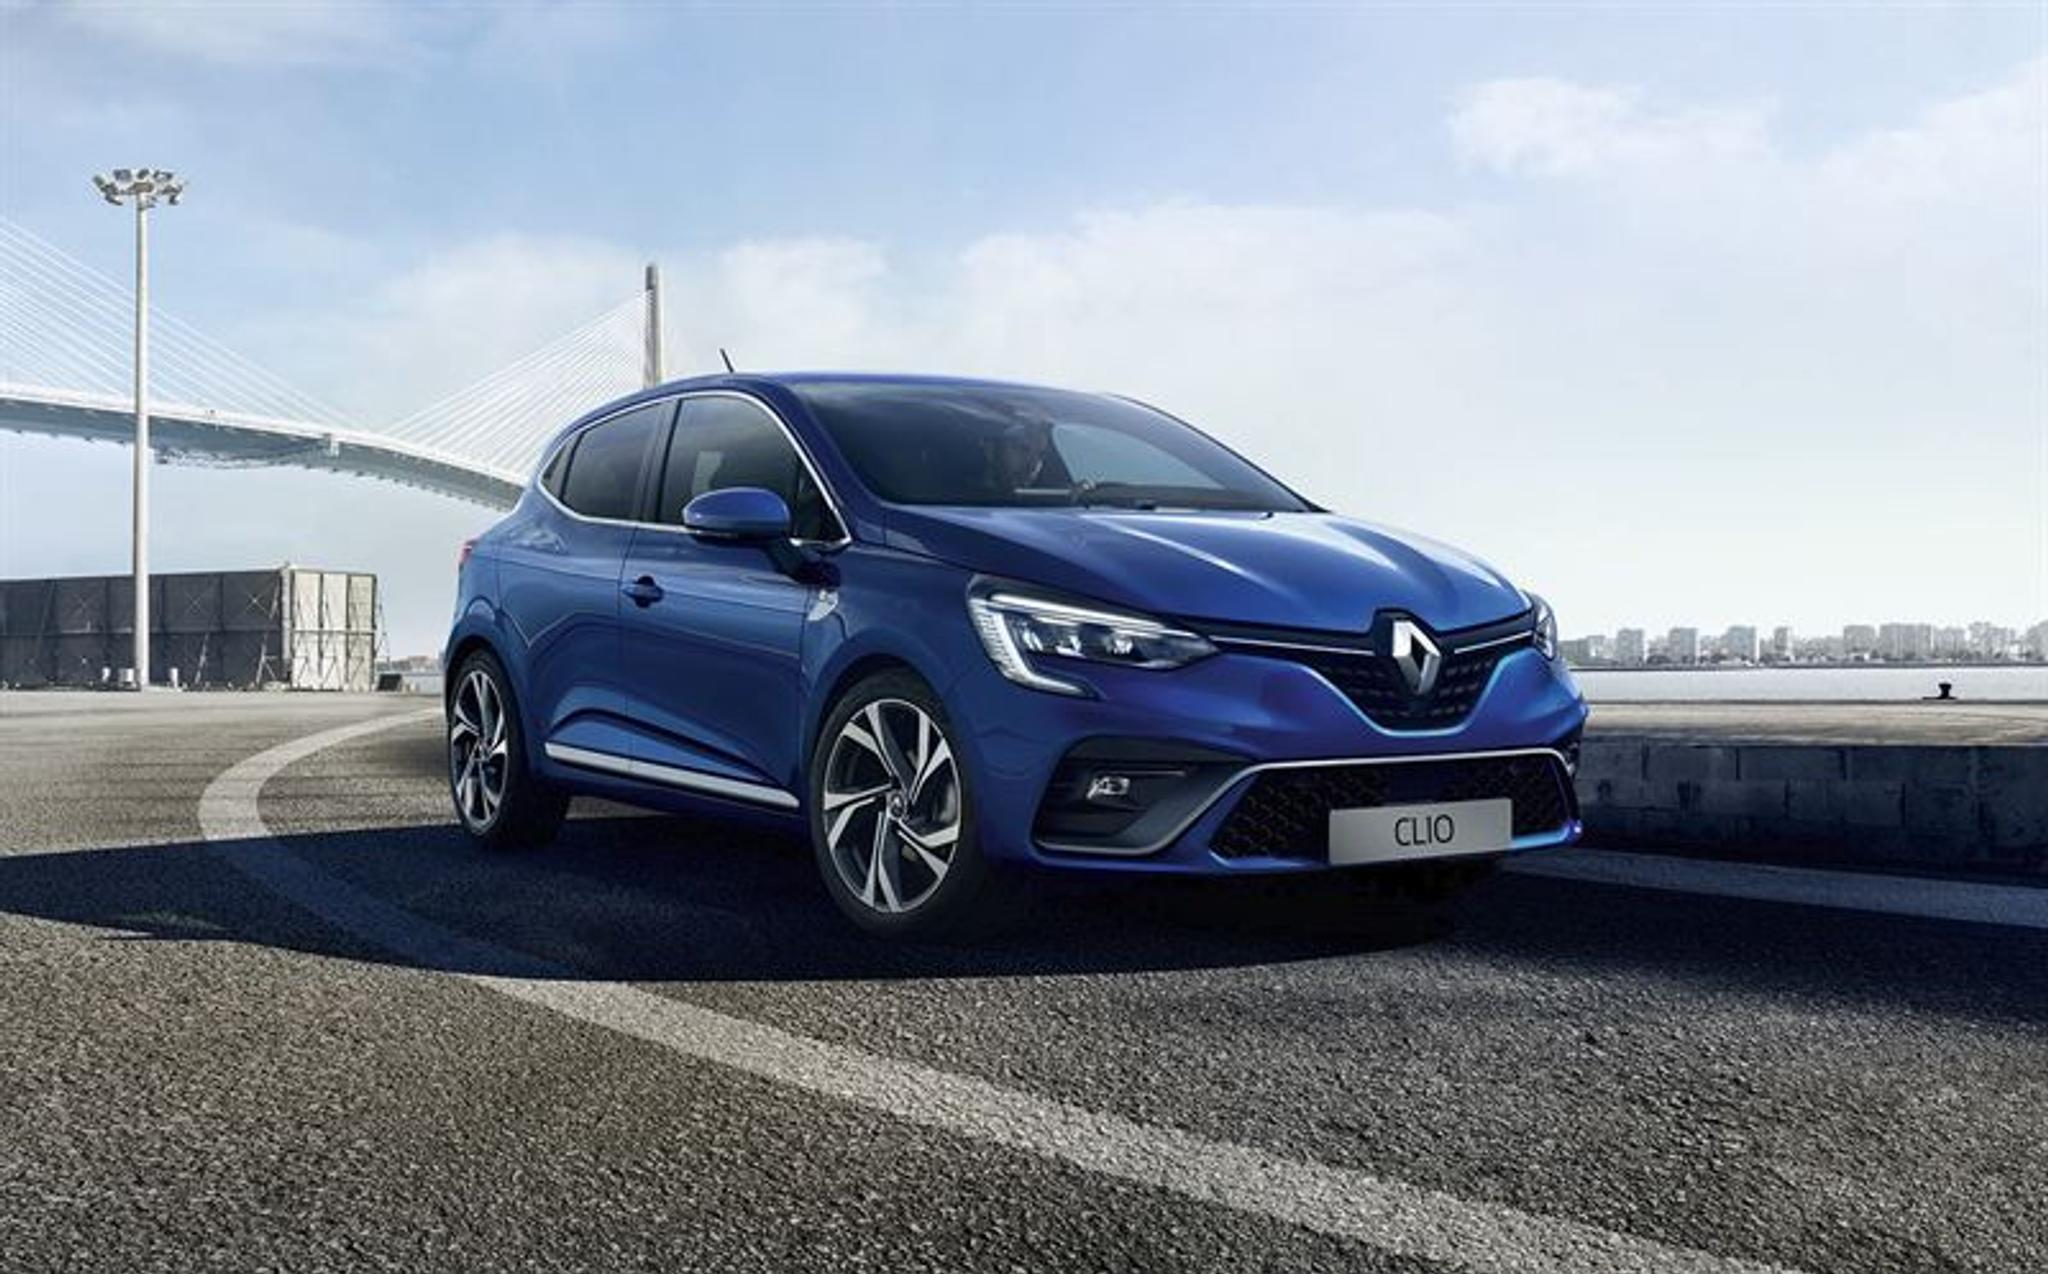 Renault Clio Rs >> Renaultilta Uusi Suorituskykyinen Clio R S Line Tuulilasi